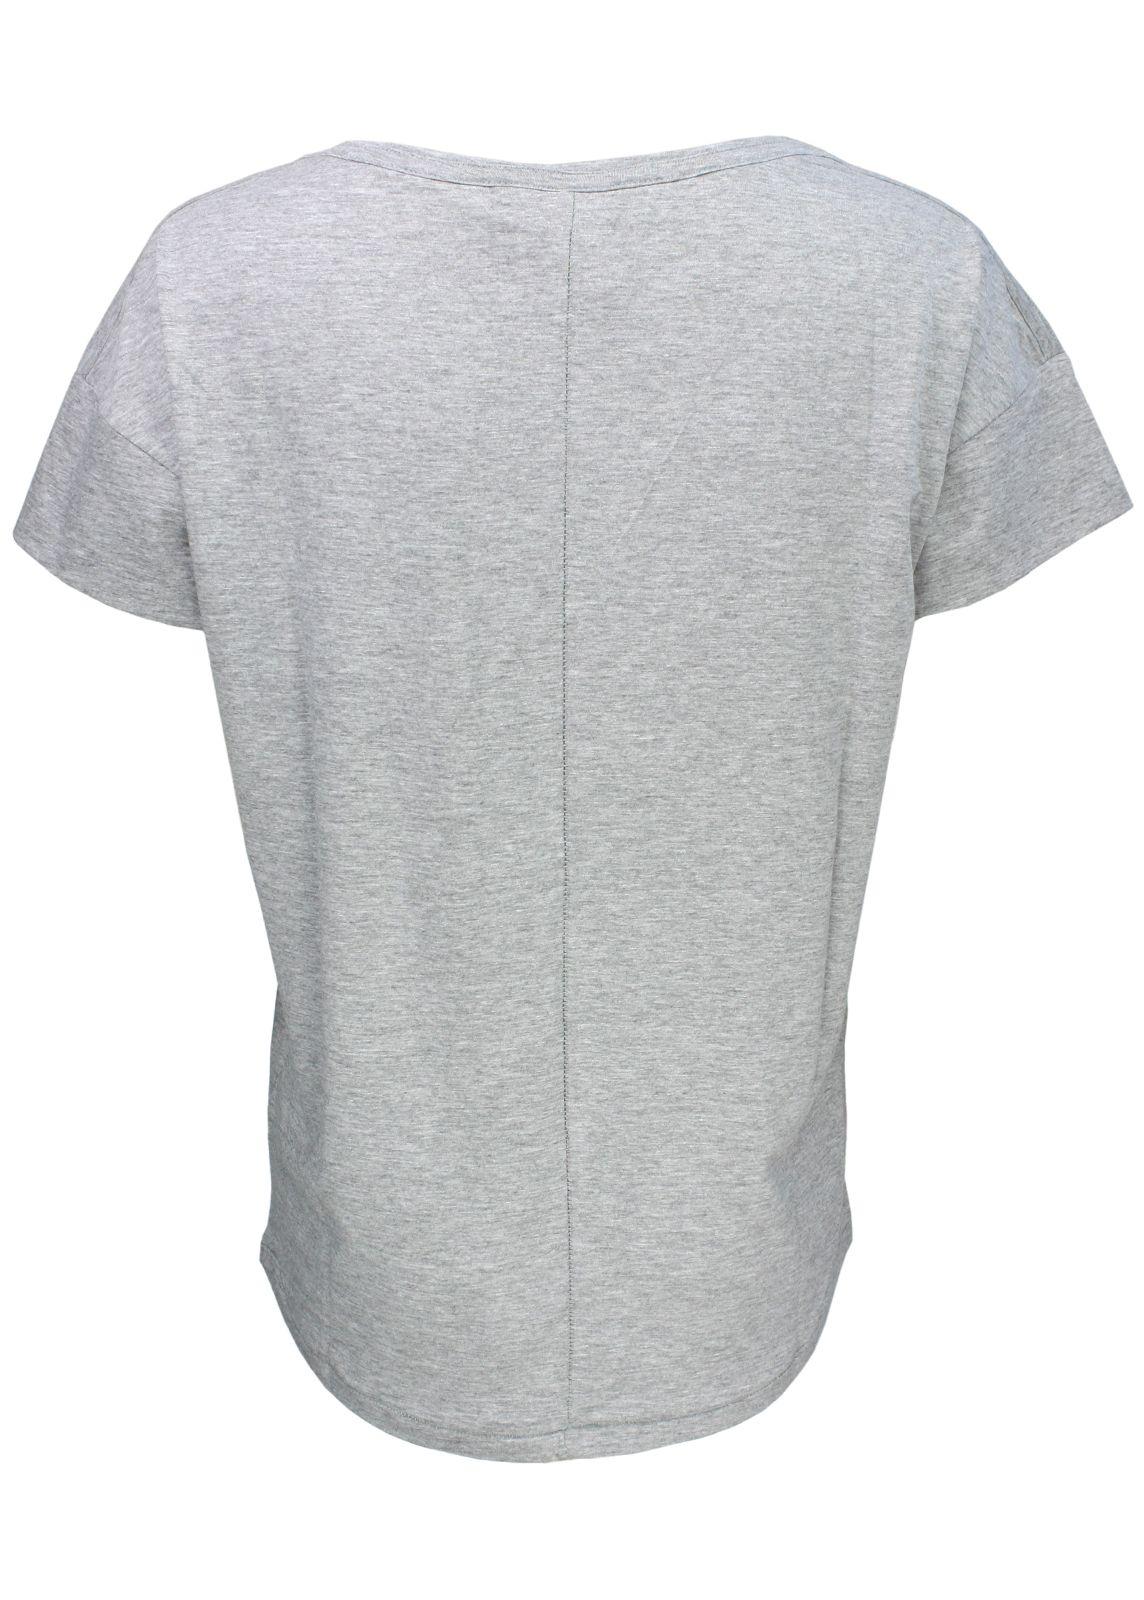 Broadway Oversize Grau Shirt Nyc 2 Bild Yqx5rYwf